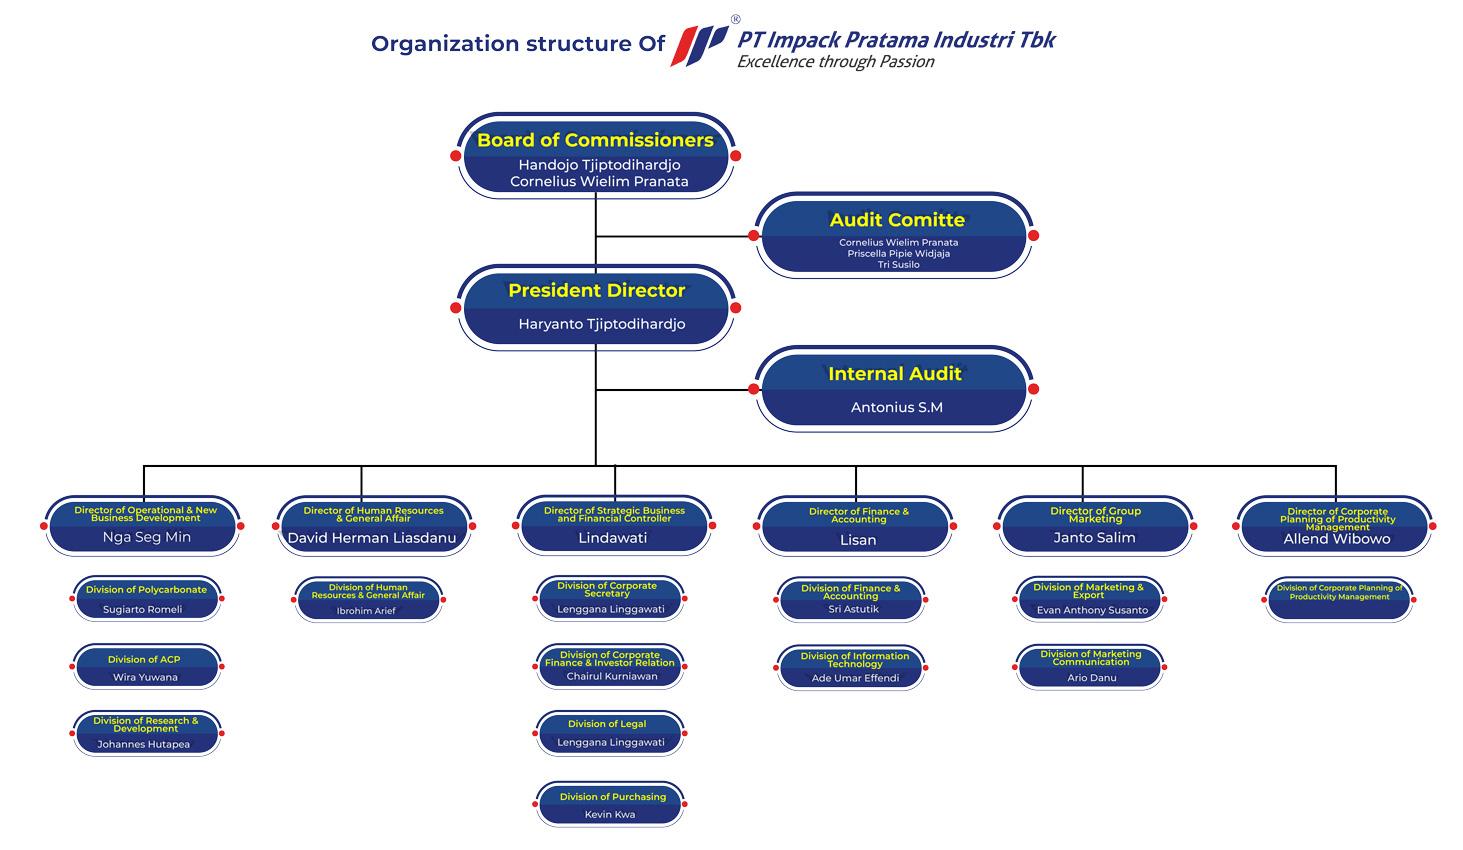 organization group impc nov 2019